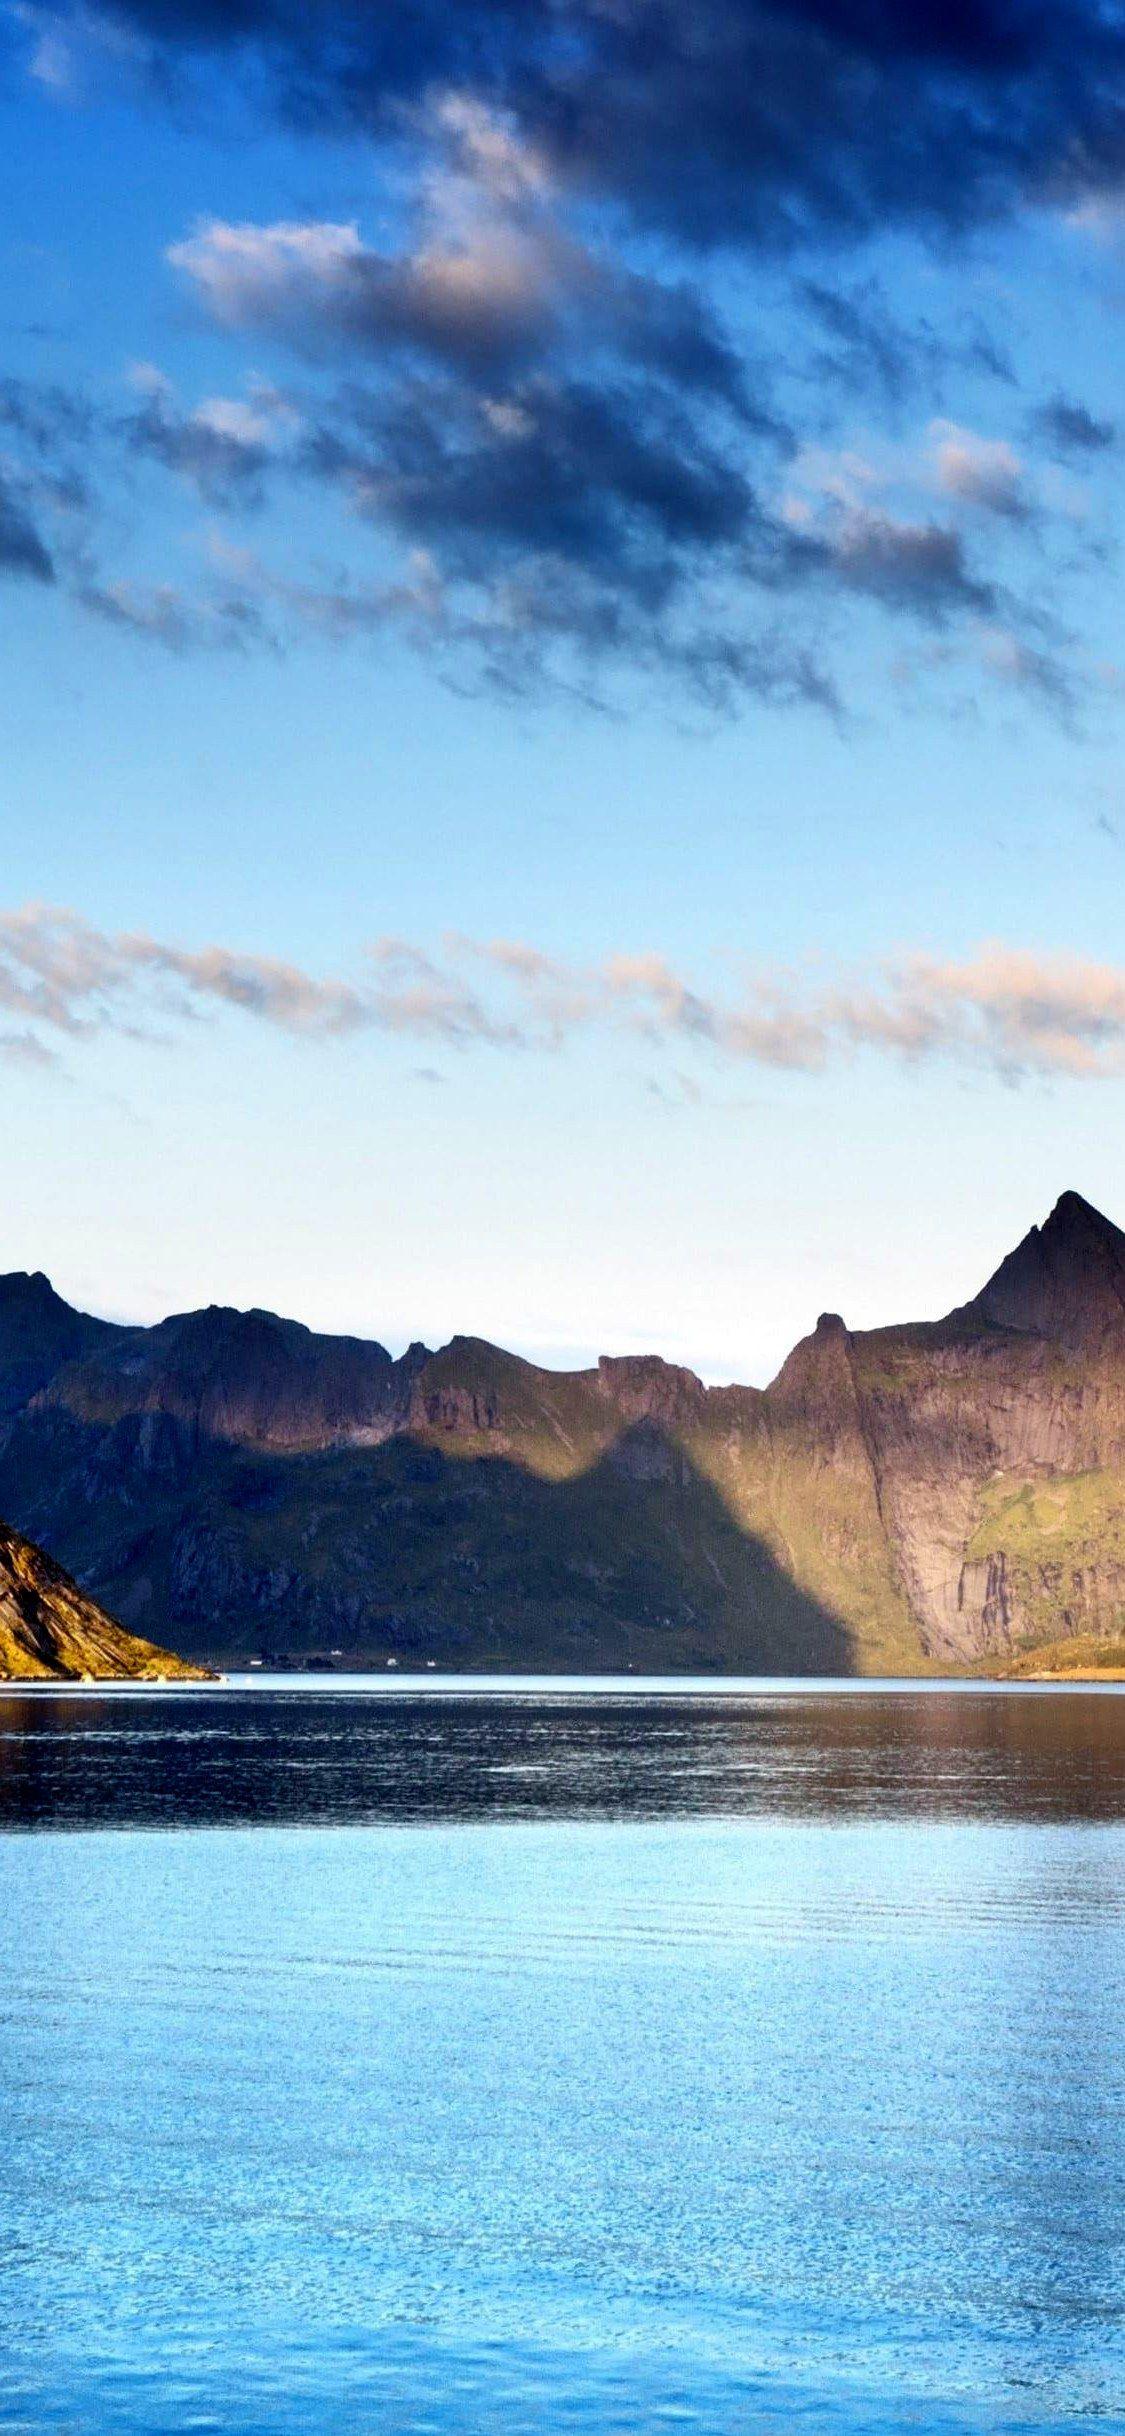 Norway Lofoten Islands Mountains Sea Wallpaper Iphone X Wallpaper